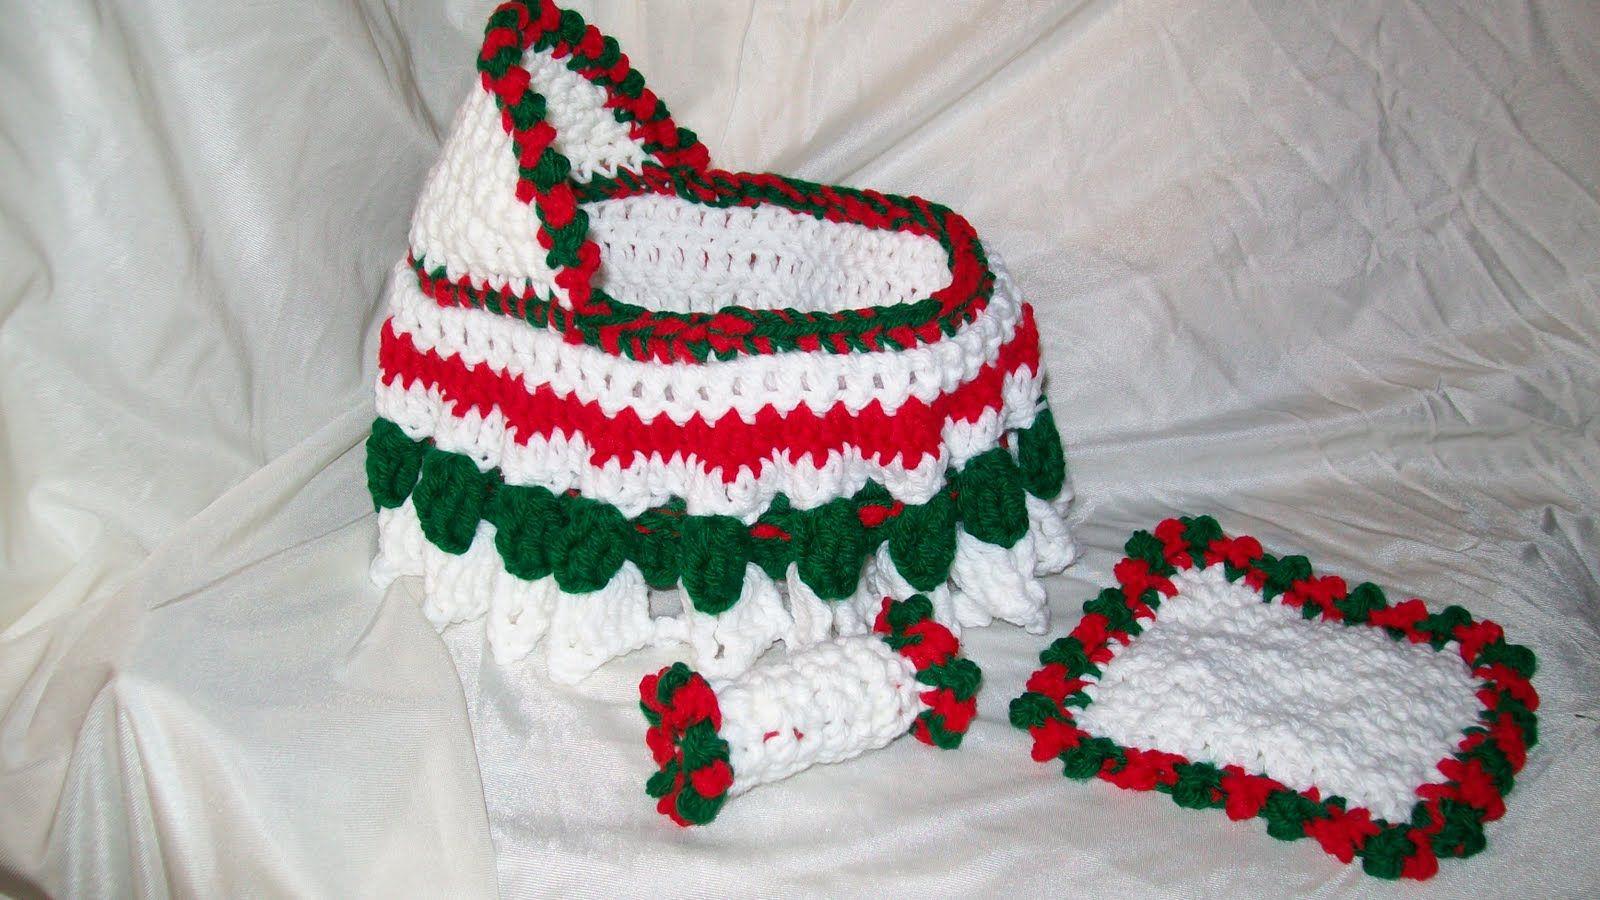 crochet bassinet purse | Crochet Cradle Purse Pattern | gift and ...